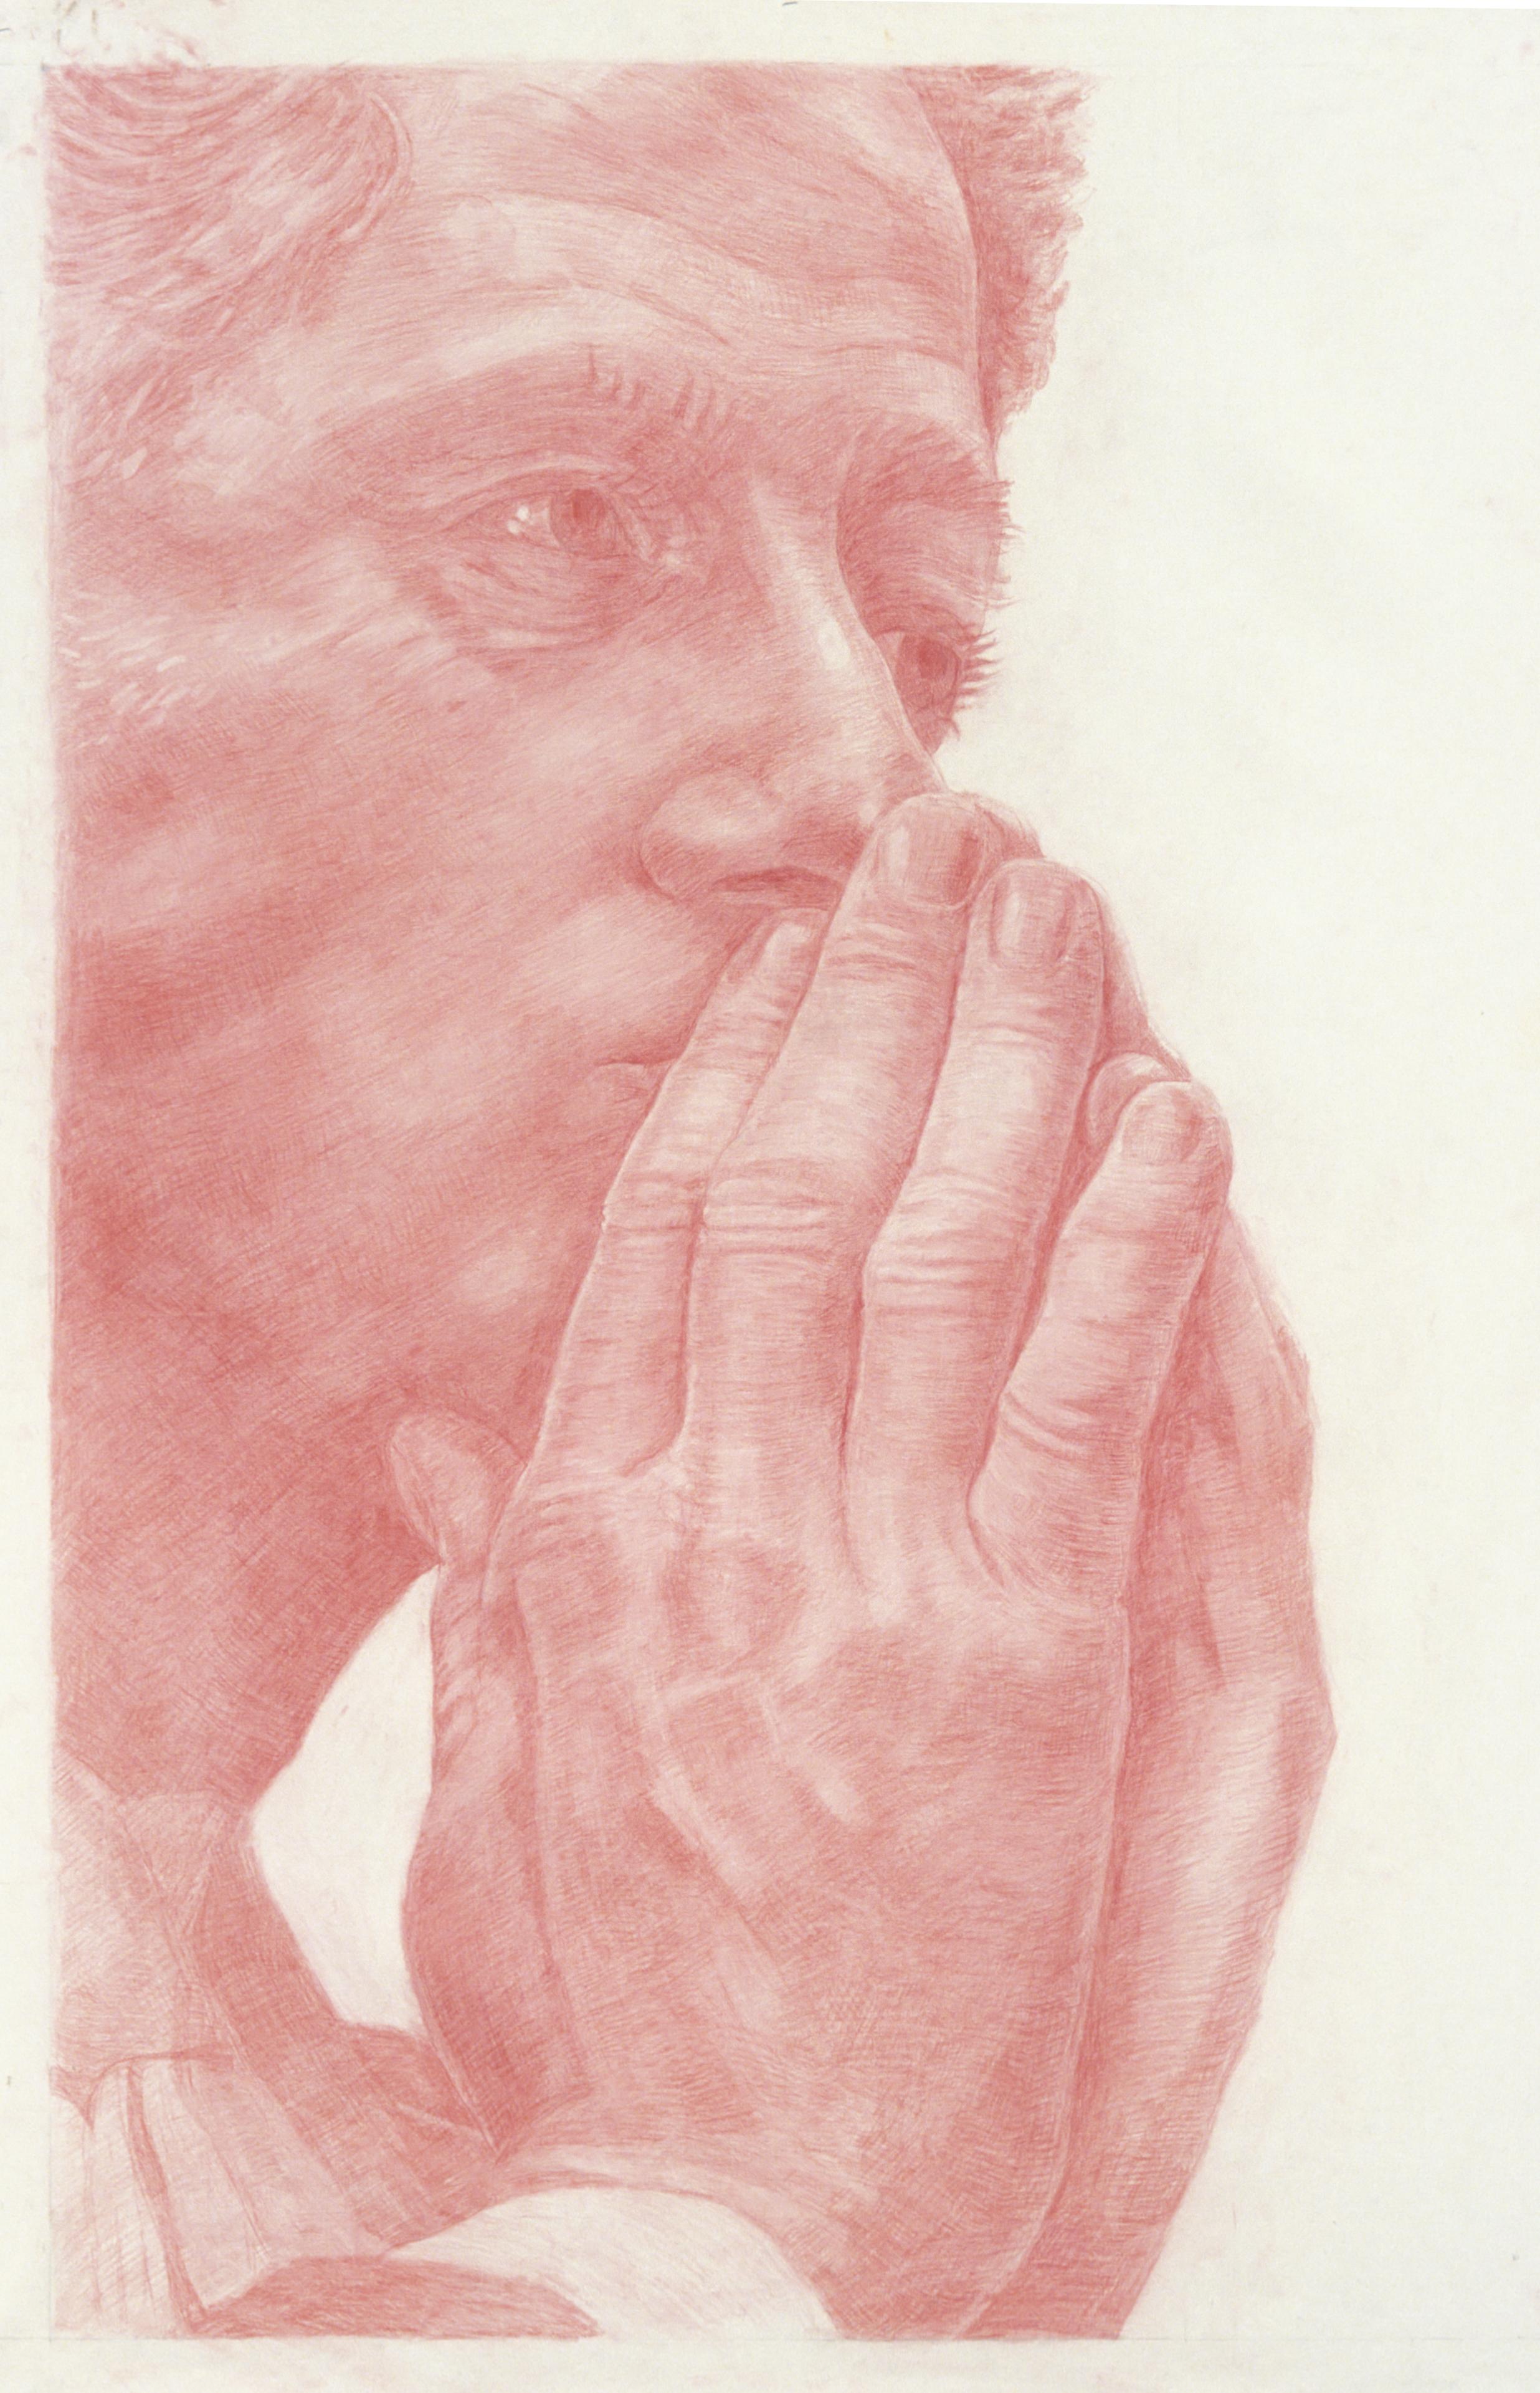 Praying Hands #4